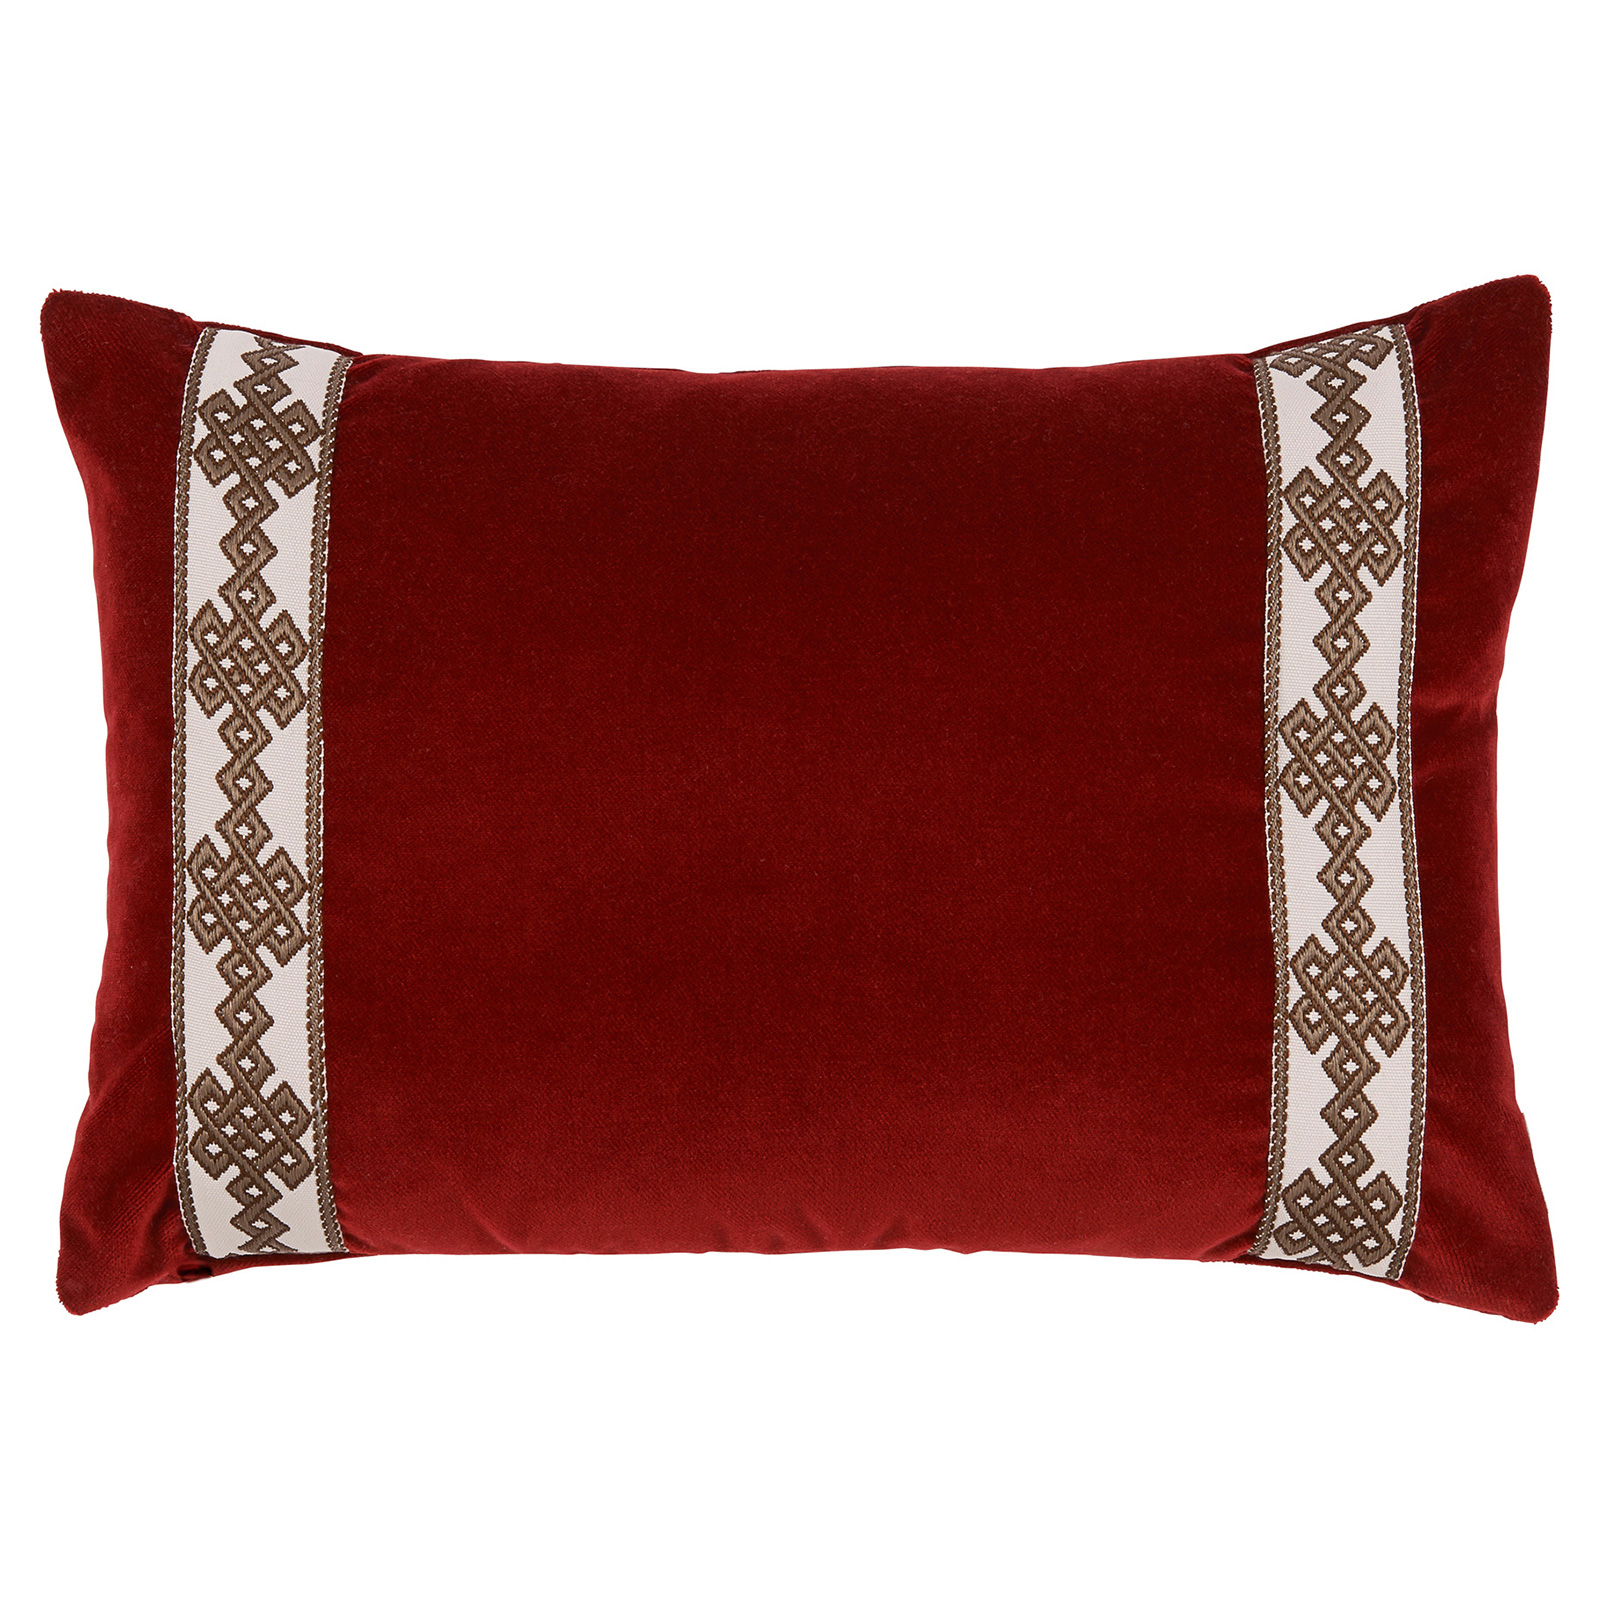 Aida Global Modern Ruby Trellis Trim Velvet Pillow - 13x19